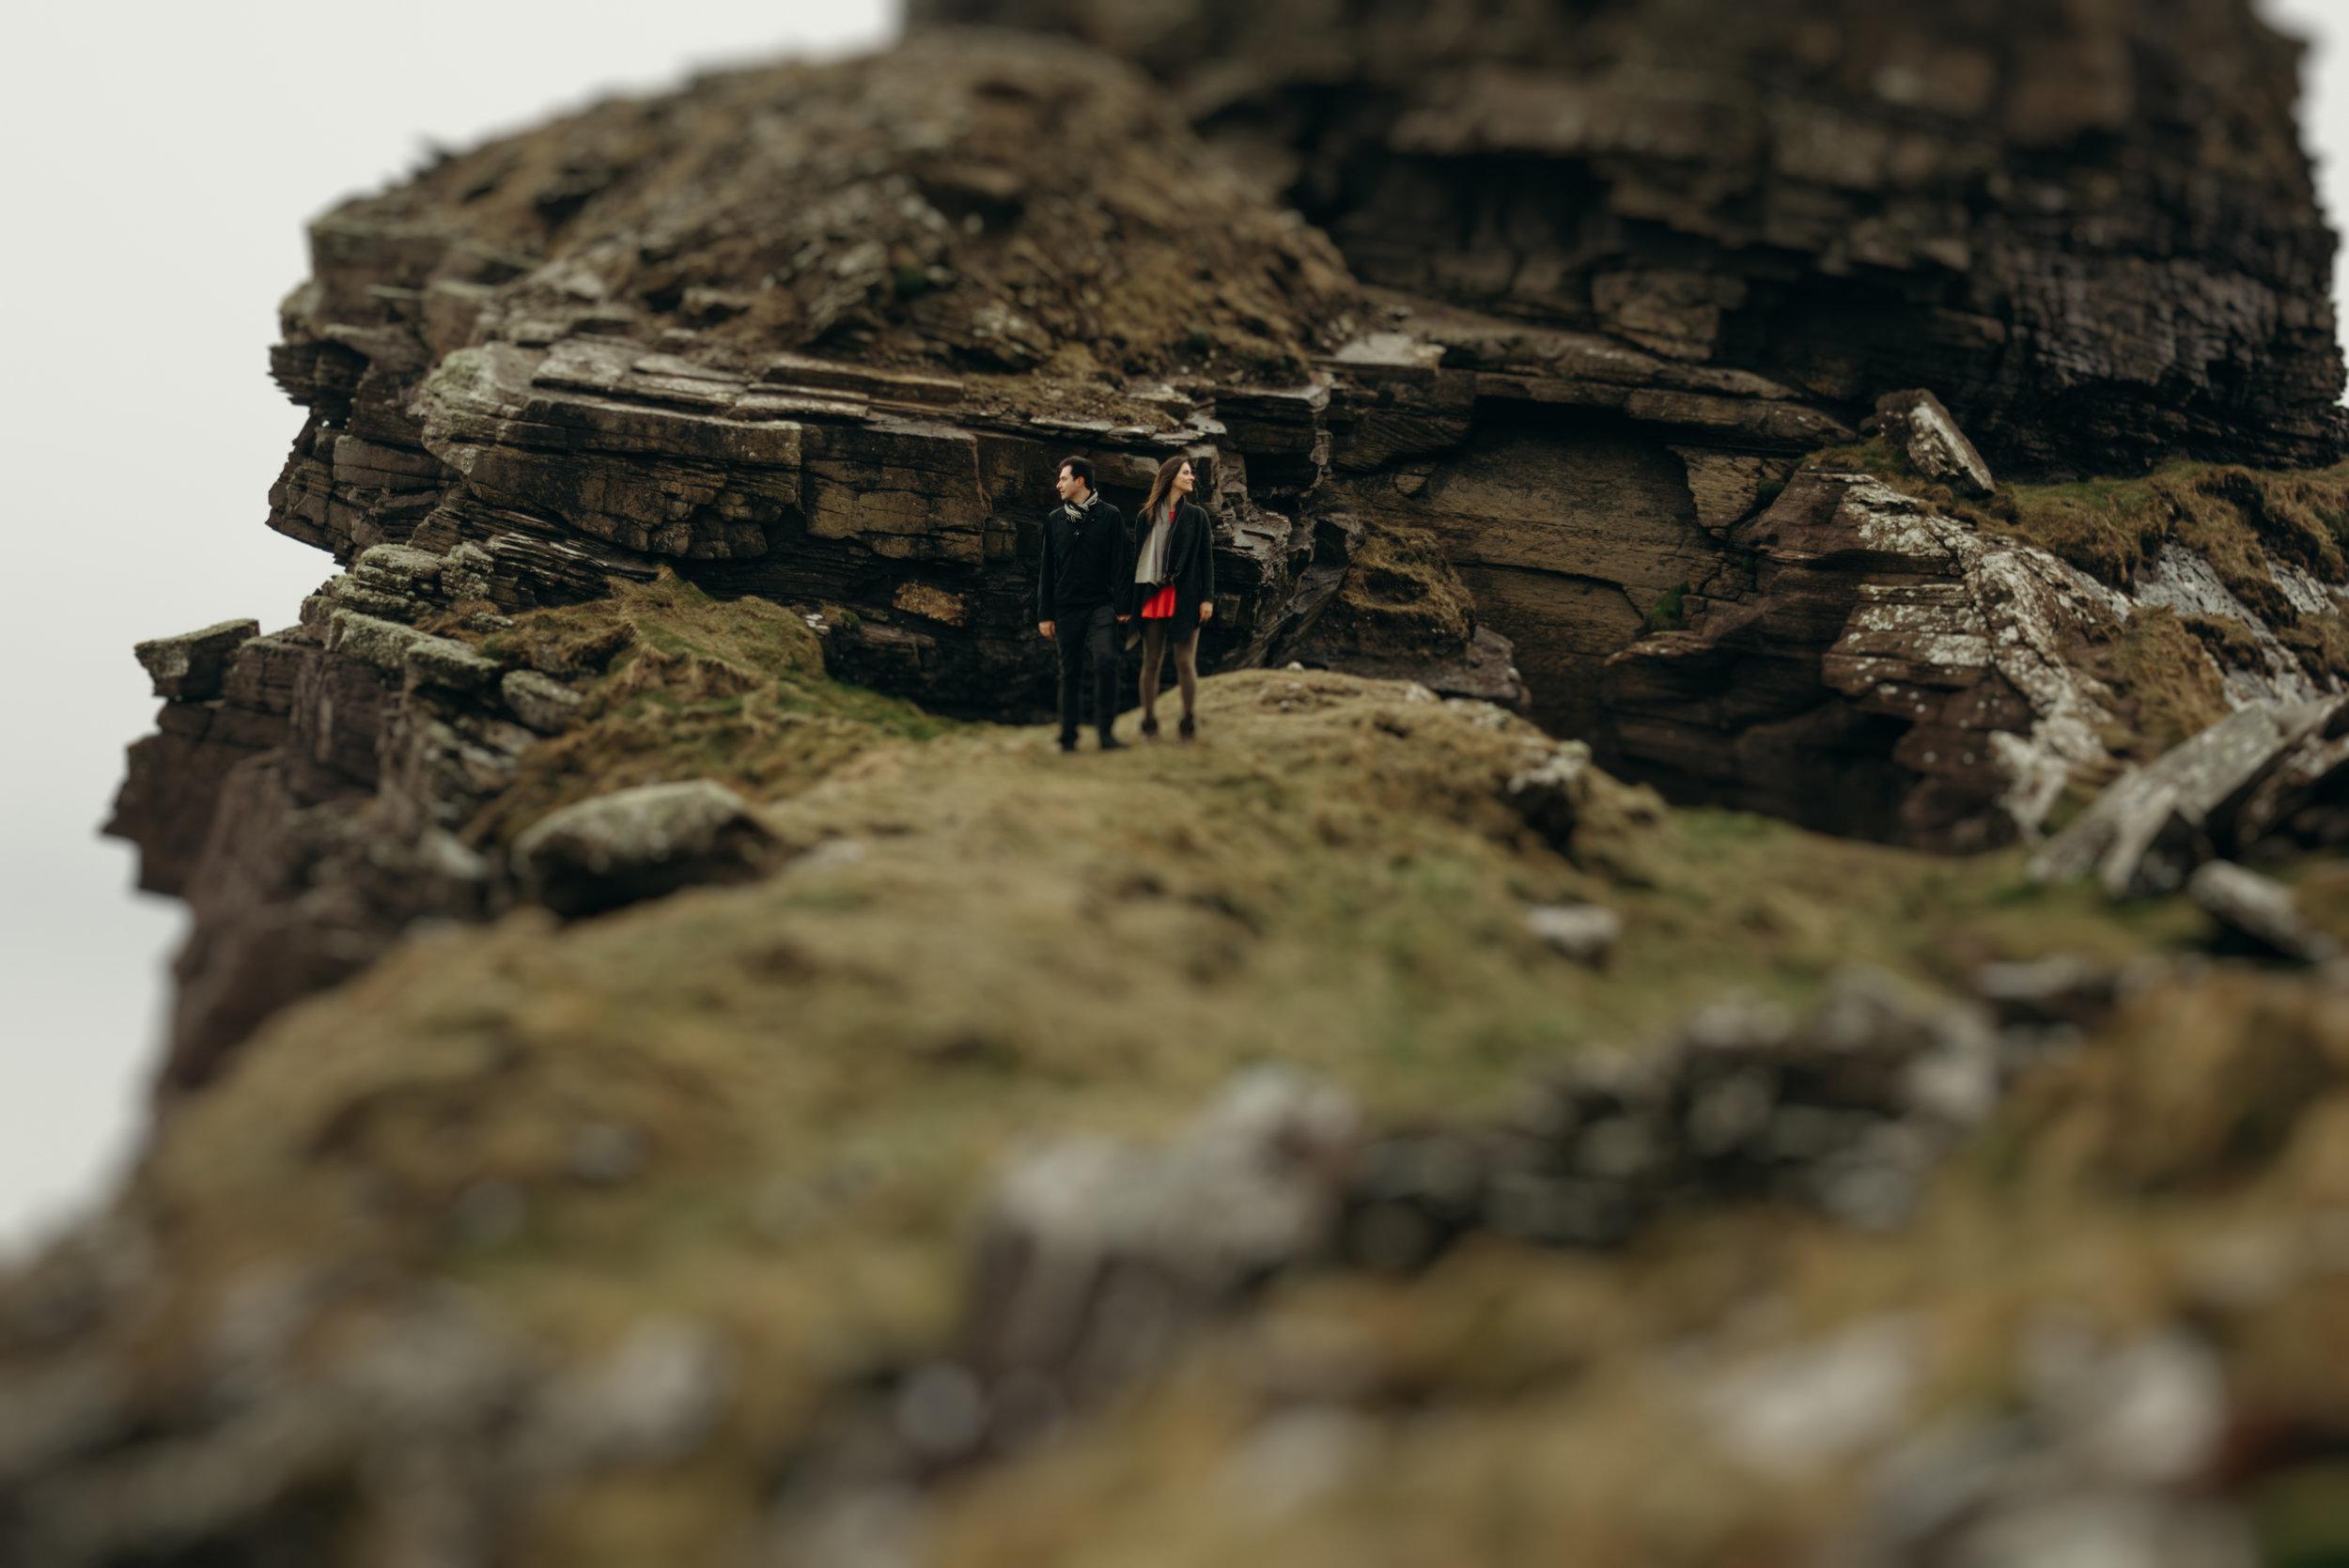 Cliffs Of Moher Engagement Session - Cliffs of Moher Proposal - Cliffs of Mhoer Elopement_6790-Edit-3.jpg